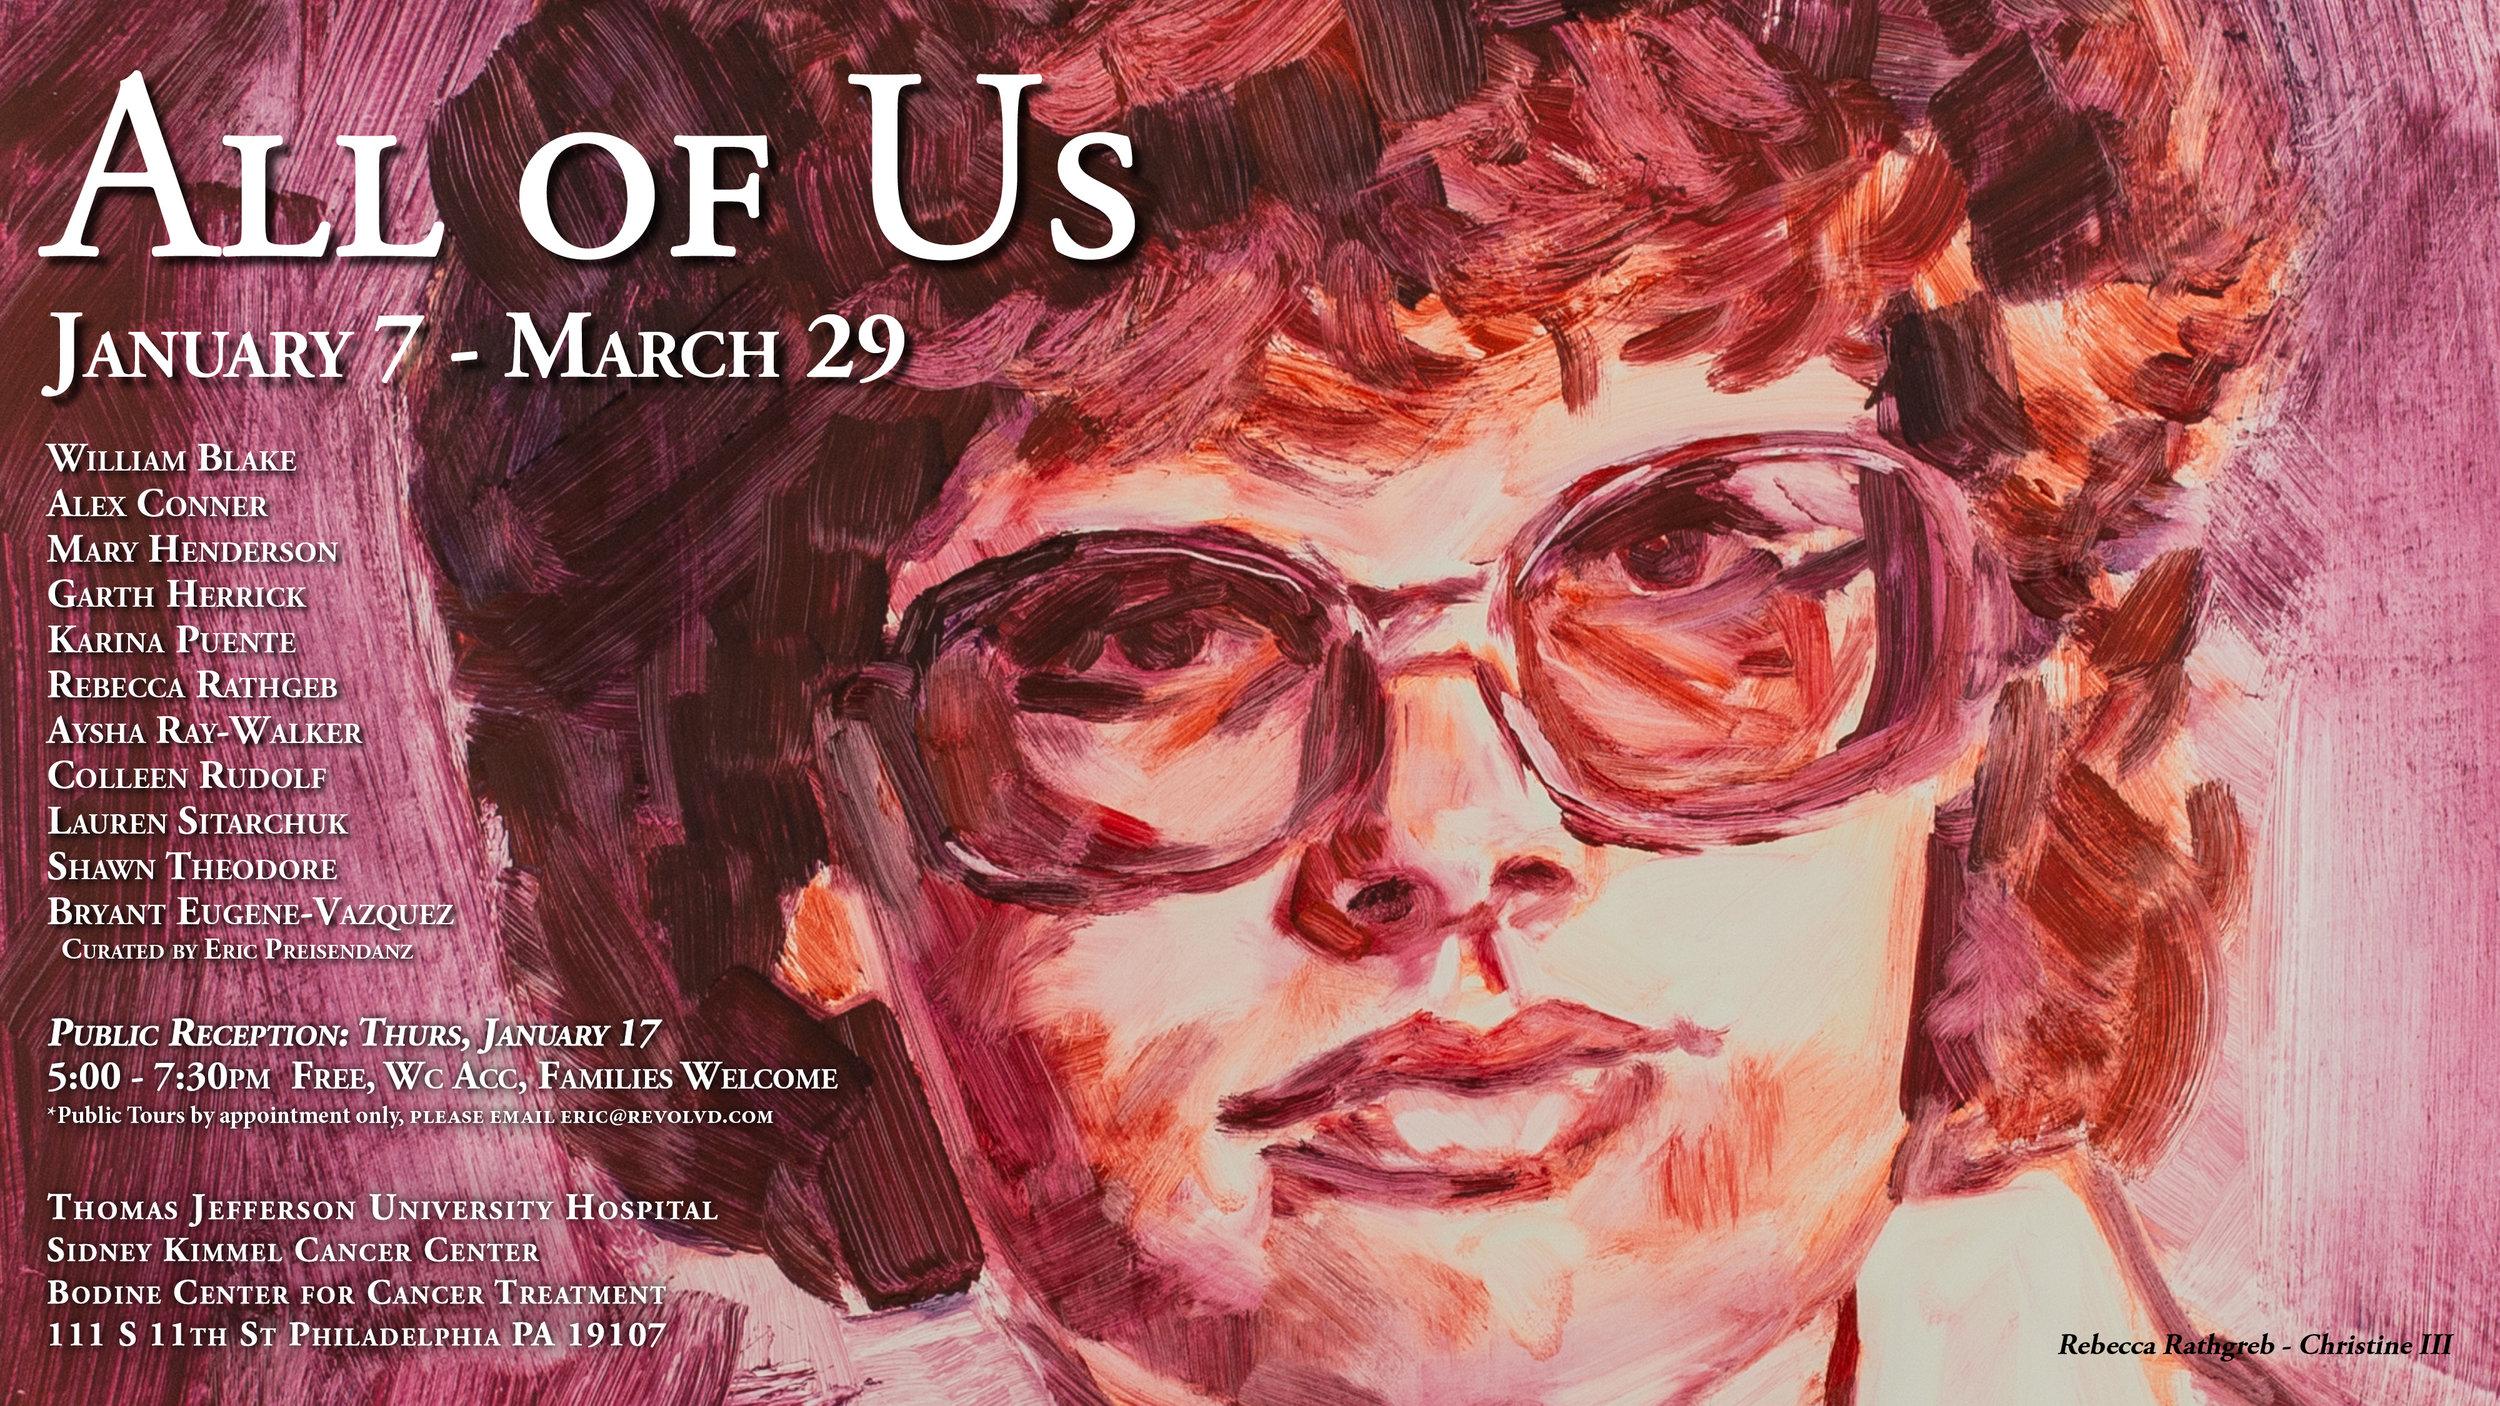 AllOf Us Facebook Event Cover.jpg